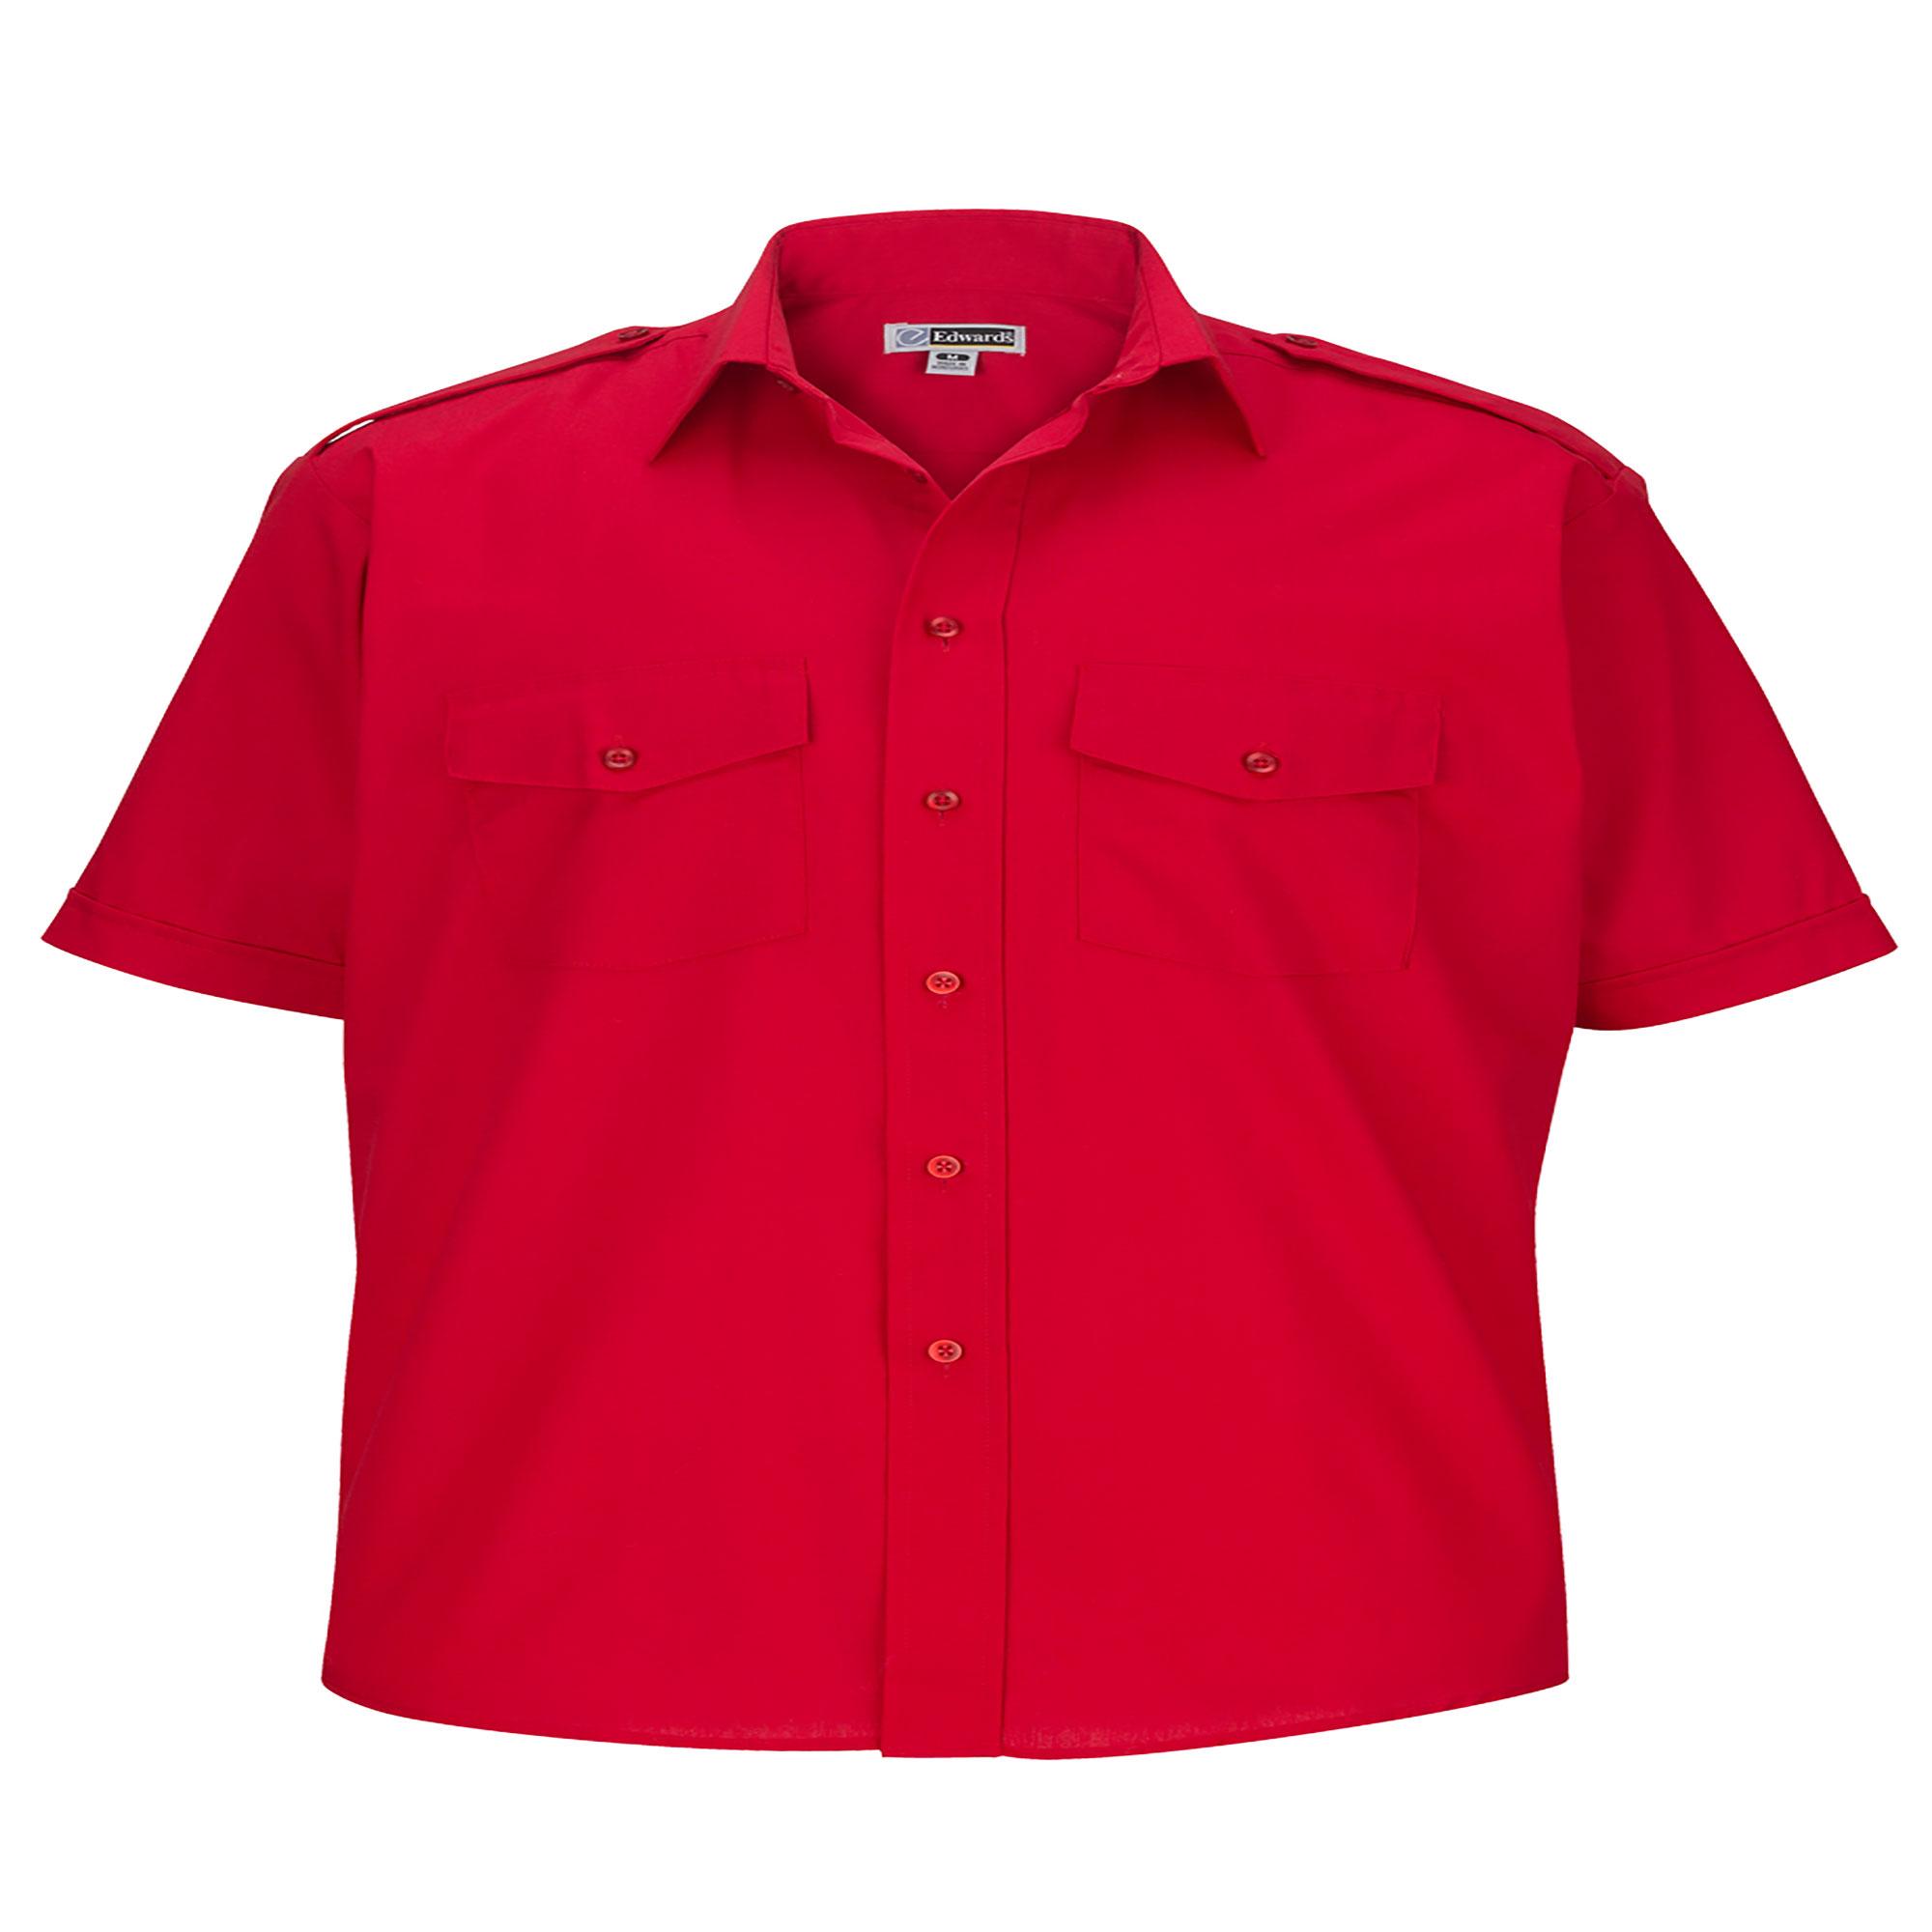 Edwards Garment Men's Big And Tall Point collar Safari Poplin Shirt, Style 1215